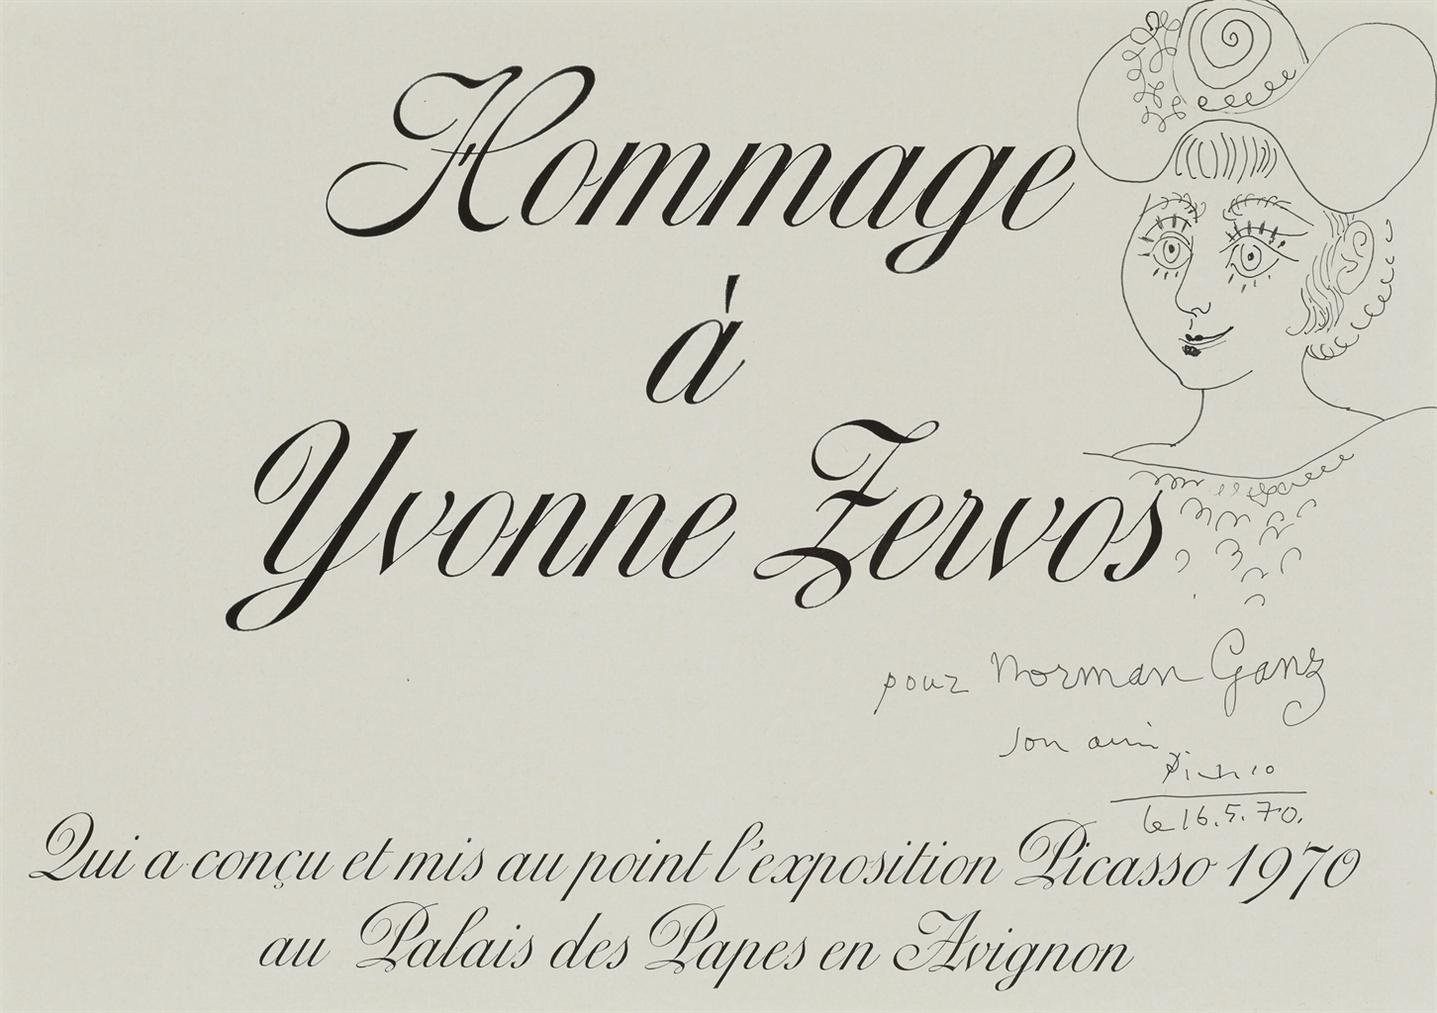 Pablo Picasso-Hommage A Yvonne Zervos-1970